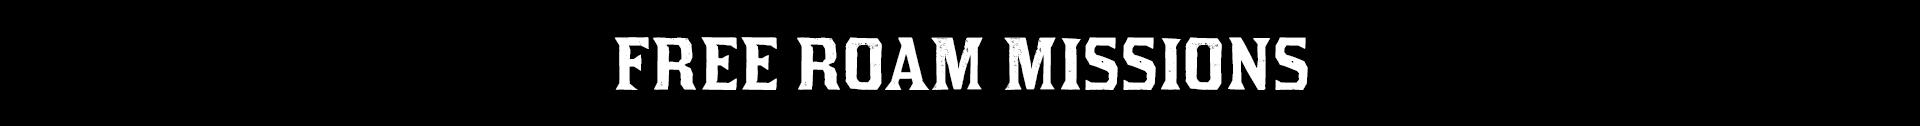 Free Roam Missions